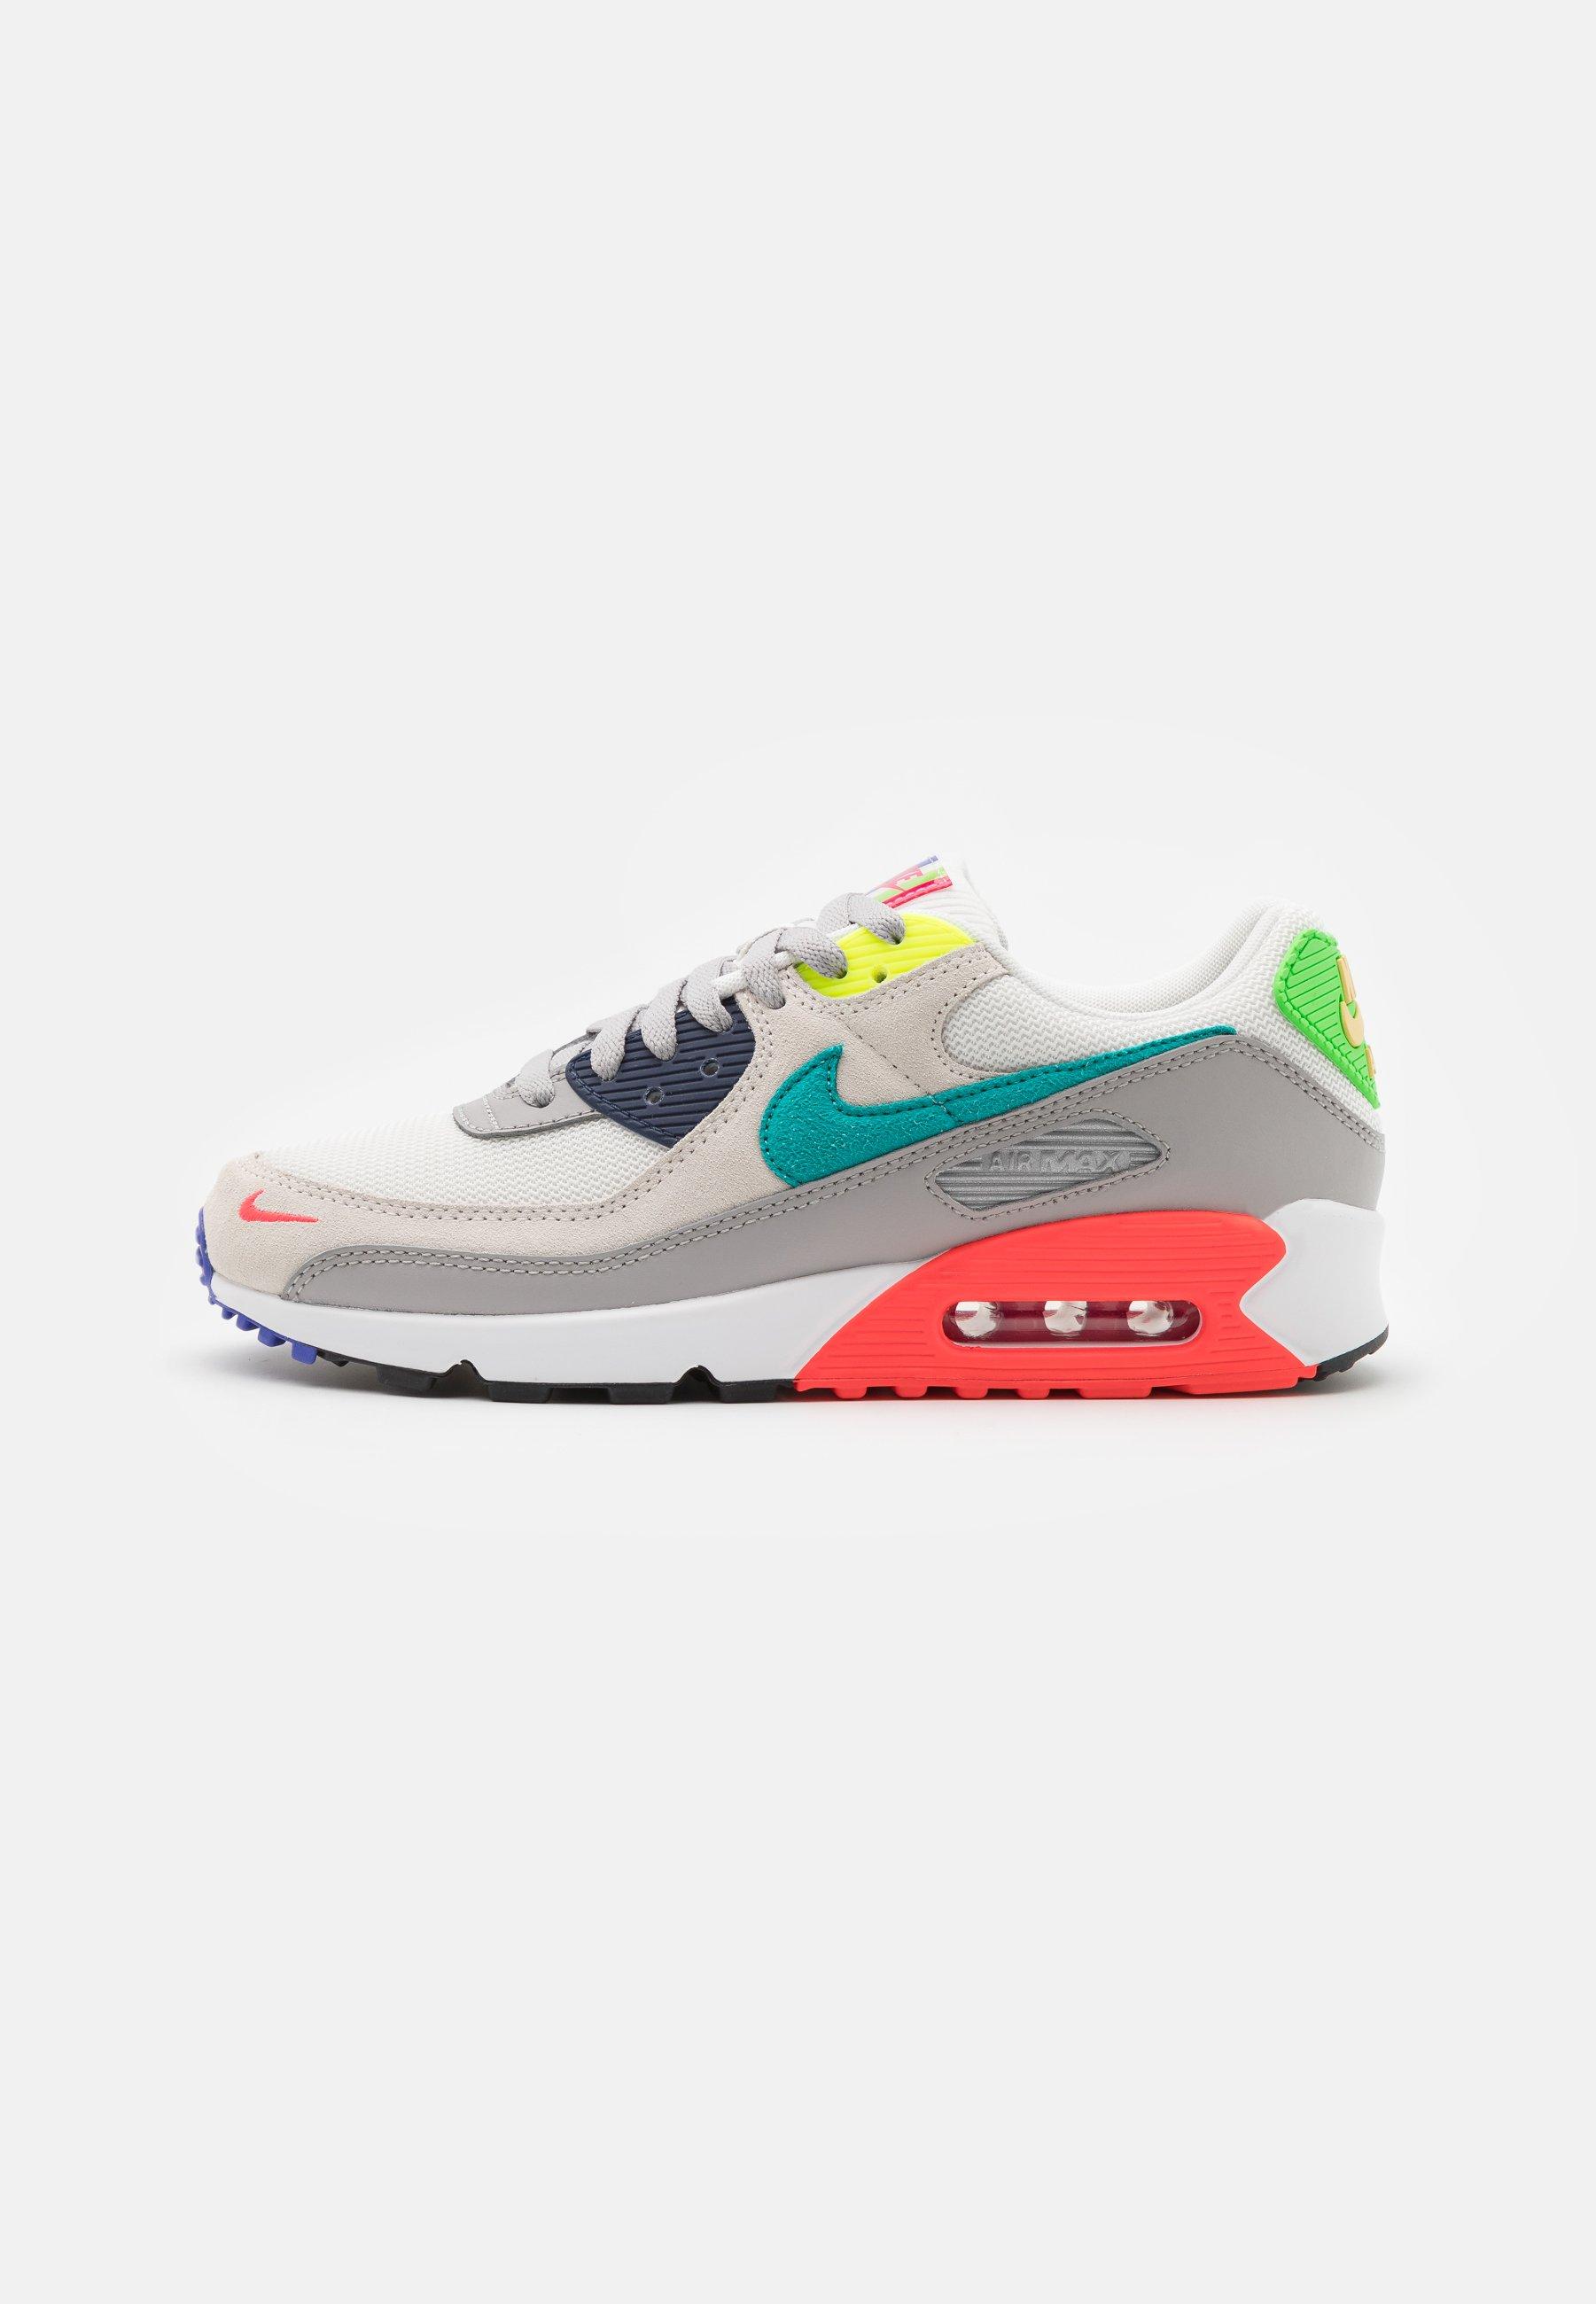 Nike Air Max 90 | La sélection de Zalando